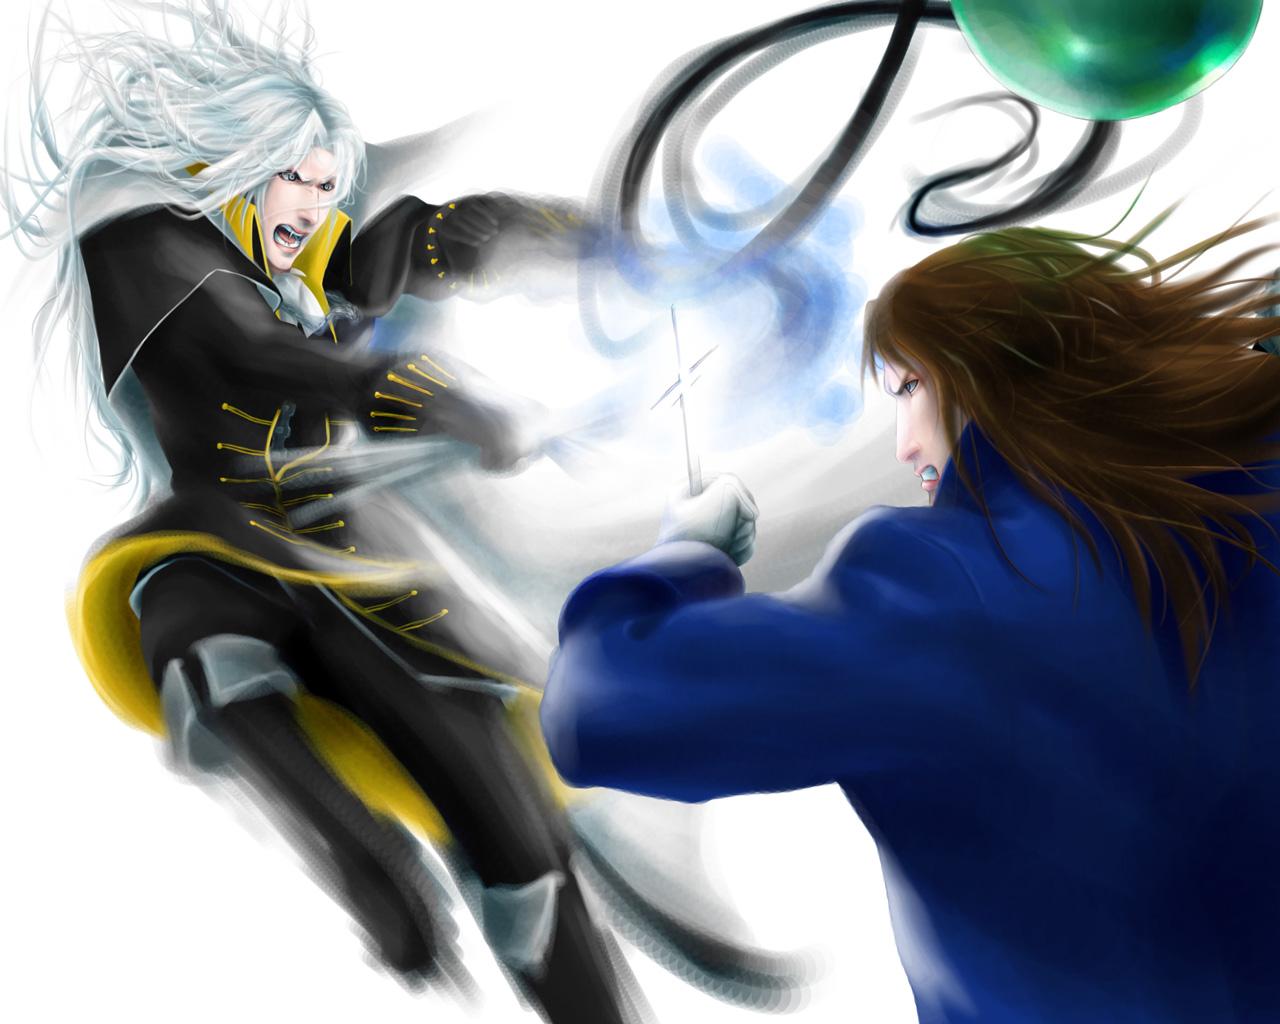 Reverse Battle by AngelusMortis